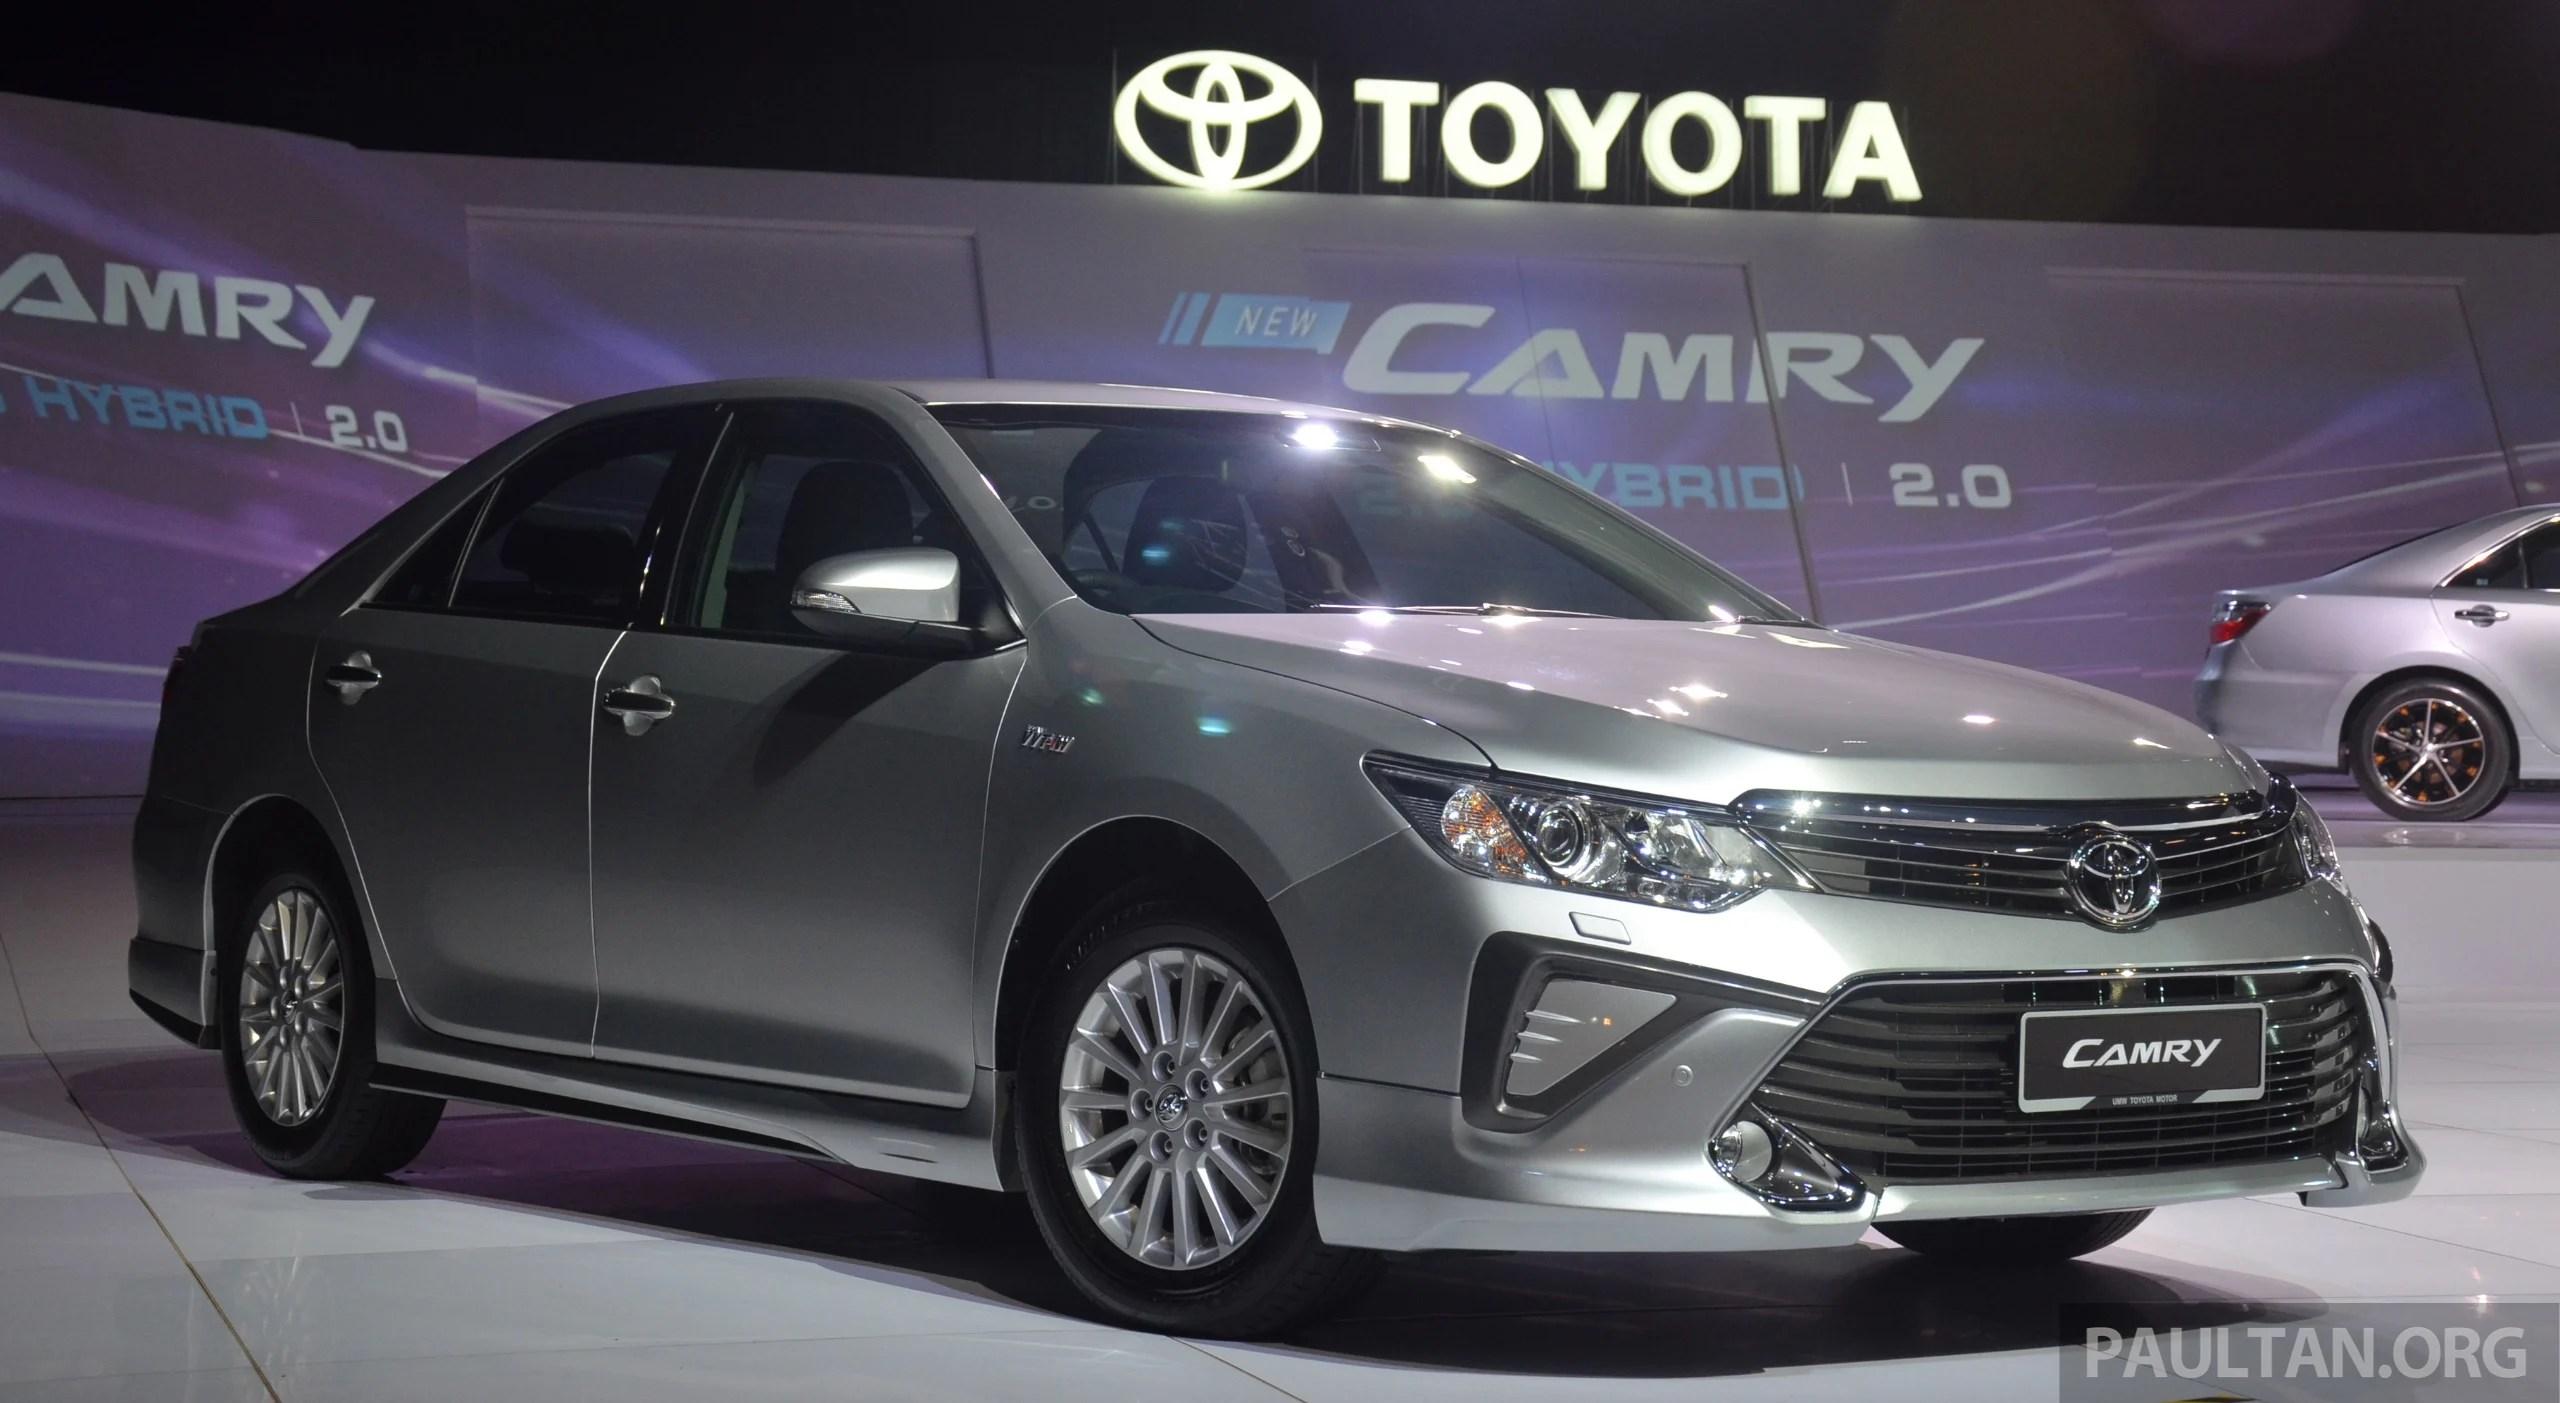 all new toyota camry malaysia interior grand avanza 1.3 g a/t 2015 launched in  6 spd 2 0e